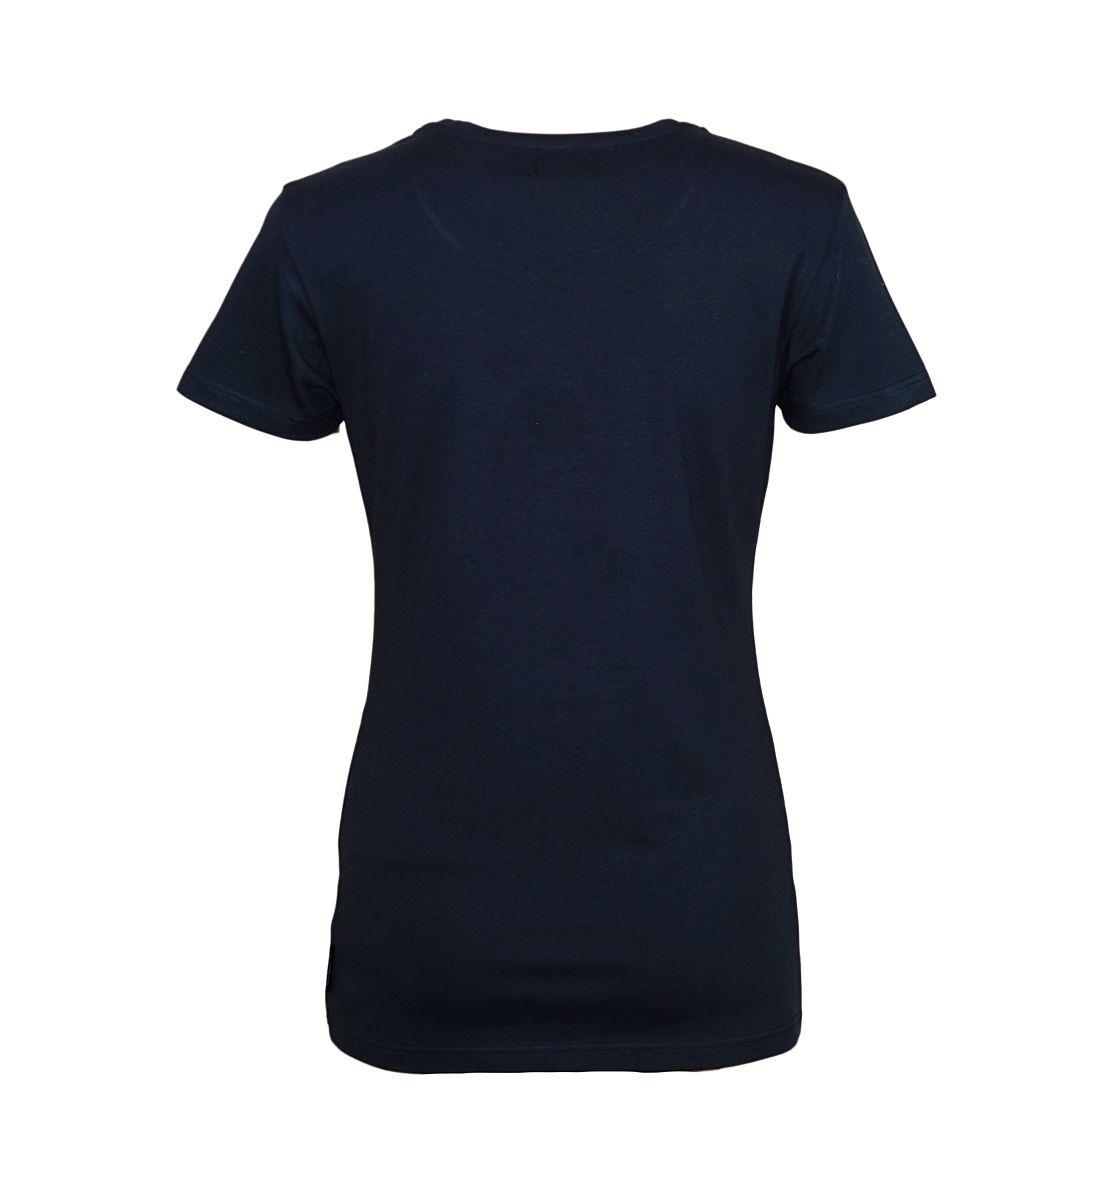 Emporio Armani Damen Shirt T-Shirt Rundhals 163139 7A263 00135 MARINE HW17-EADS1